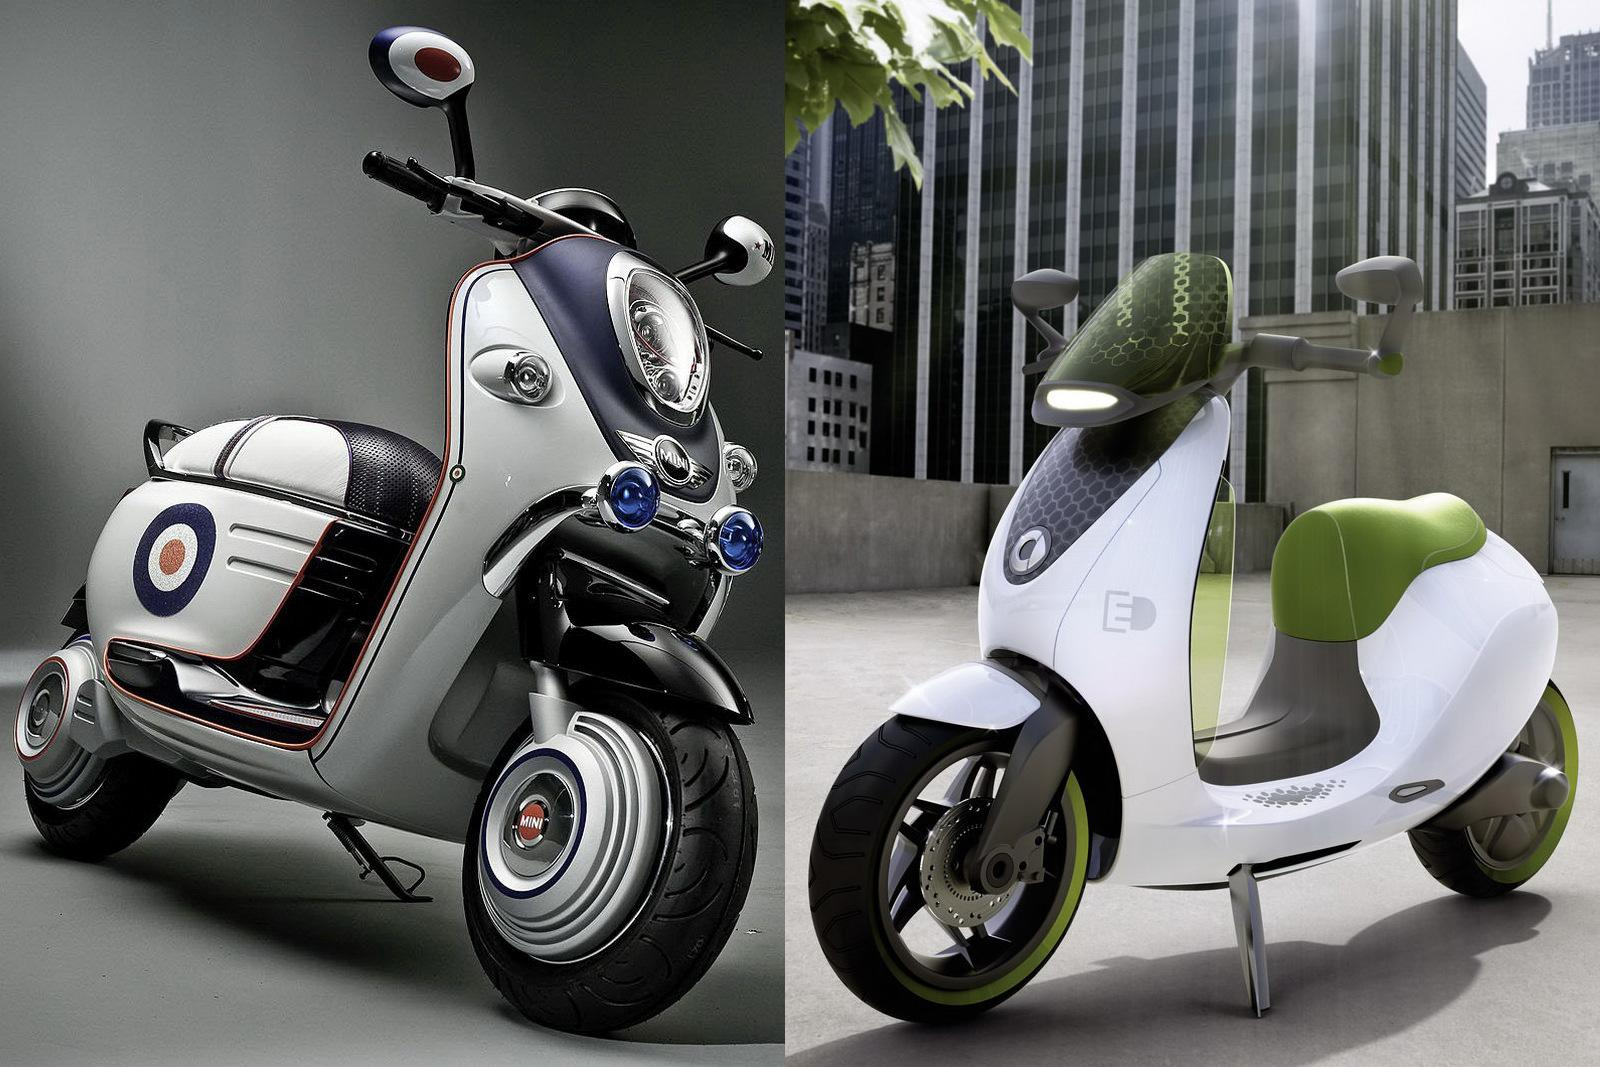 mini_smart_electric_scooters-4c9a8b024d155.jpg (1600×1067)